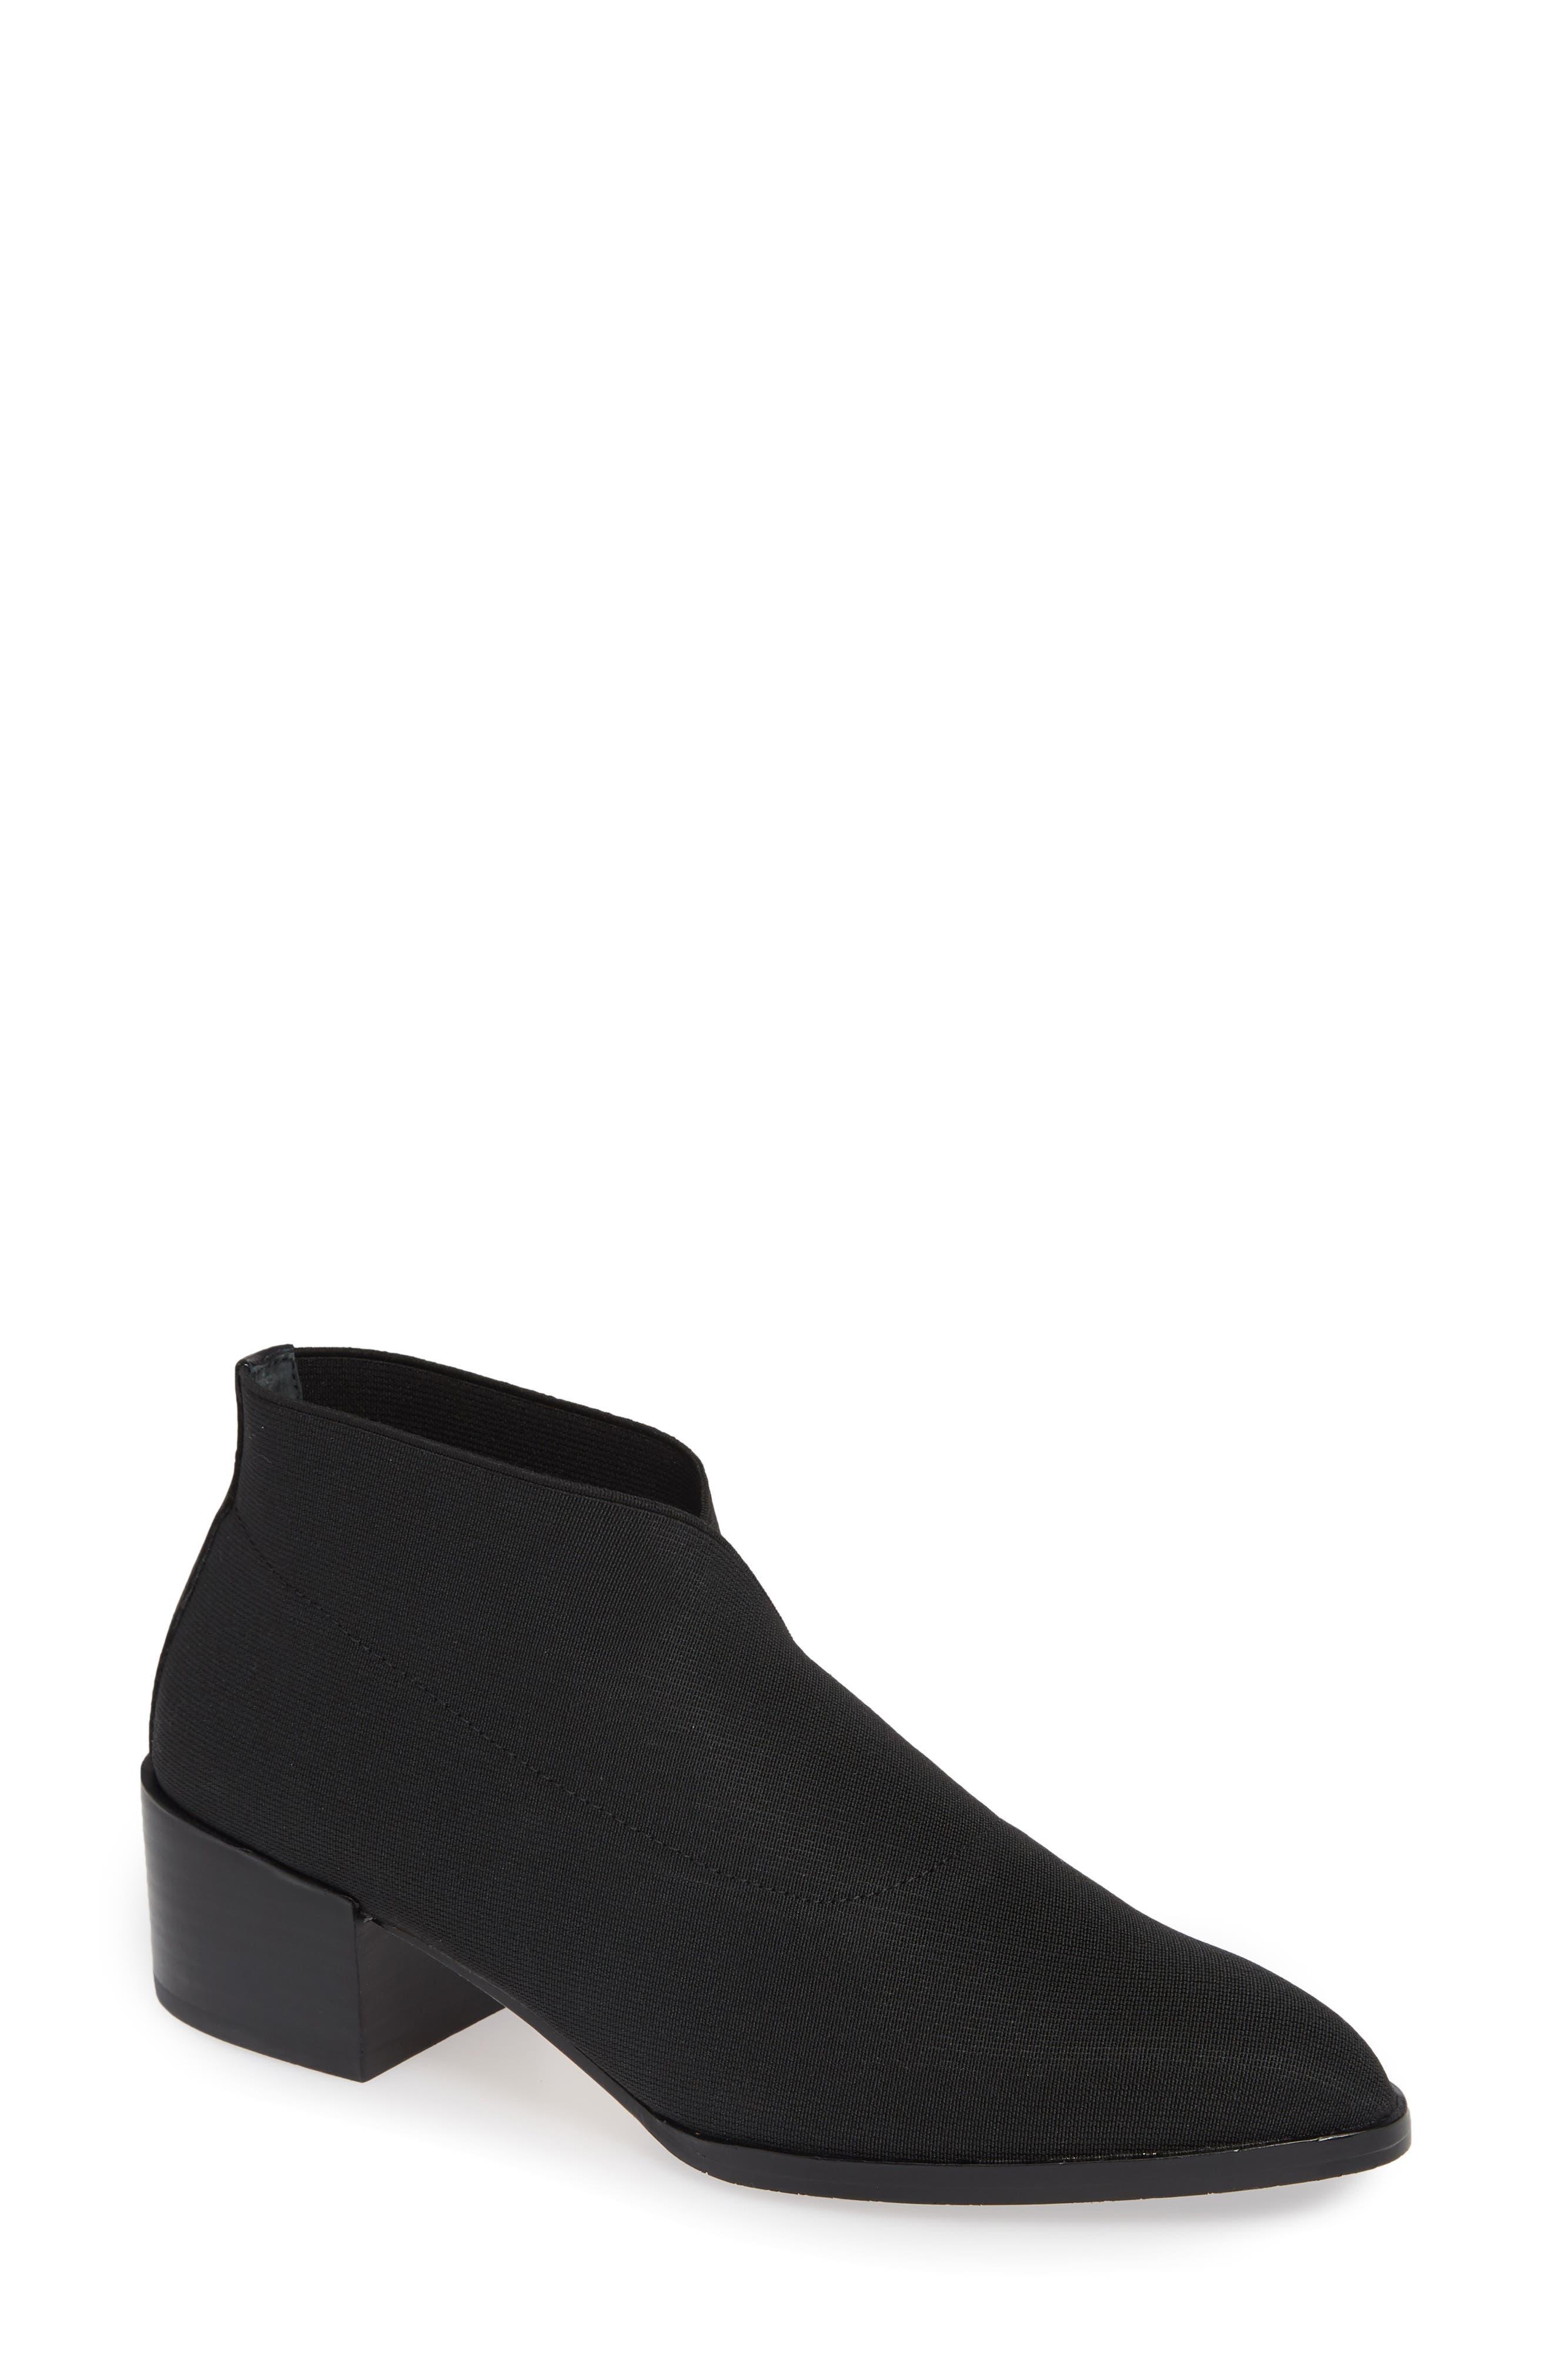 Women'S Daved Almond Toe Elastic Ankle Booties in Black Elastic